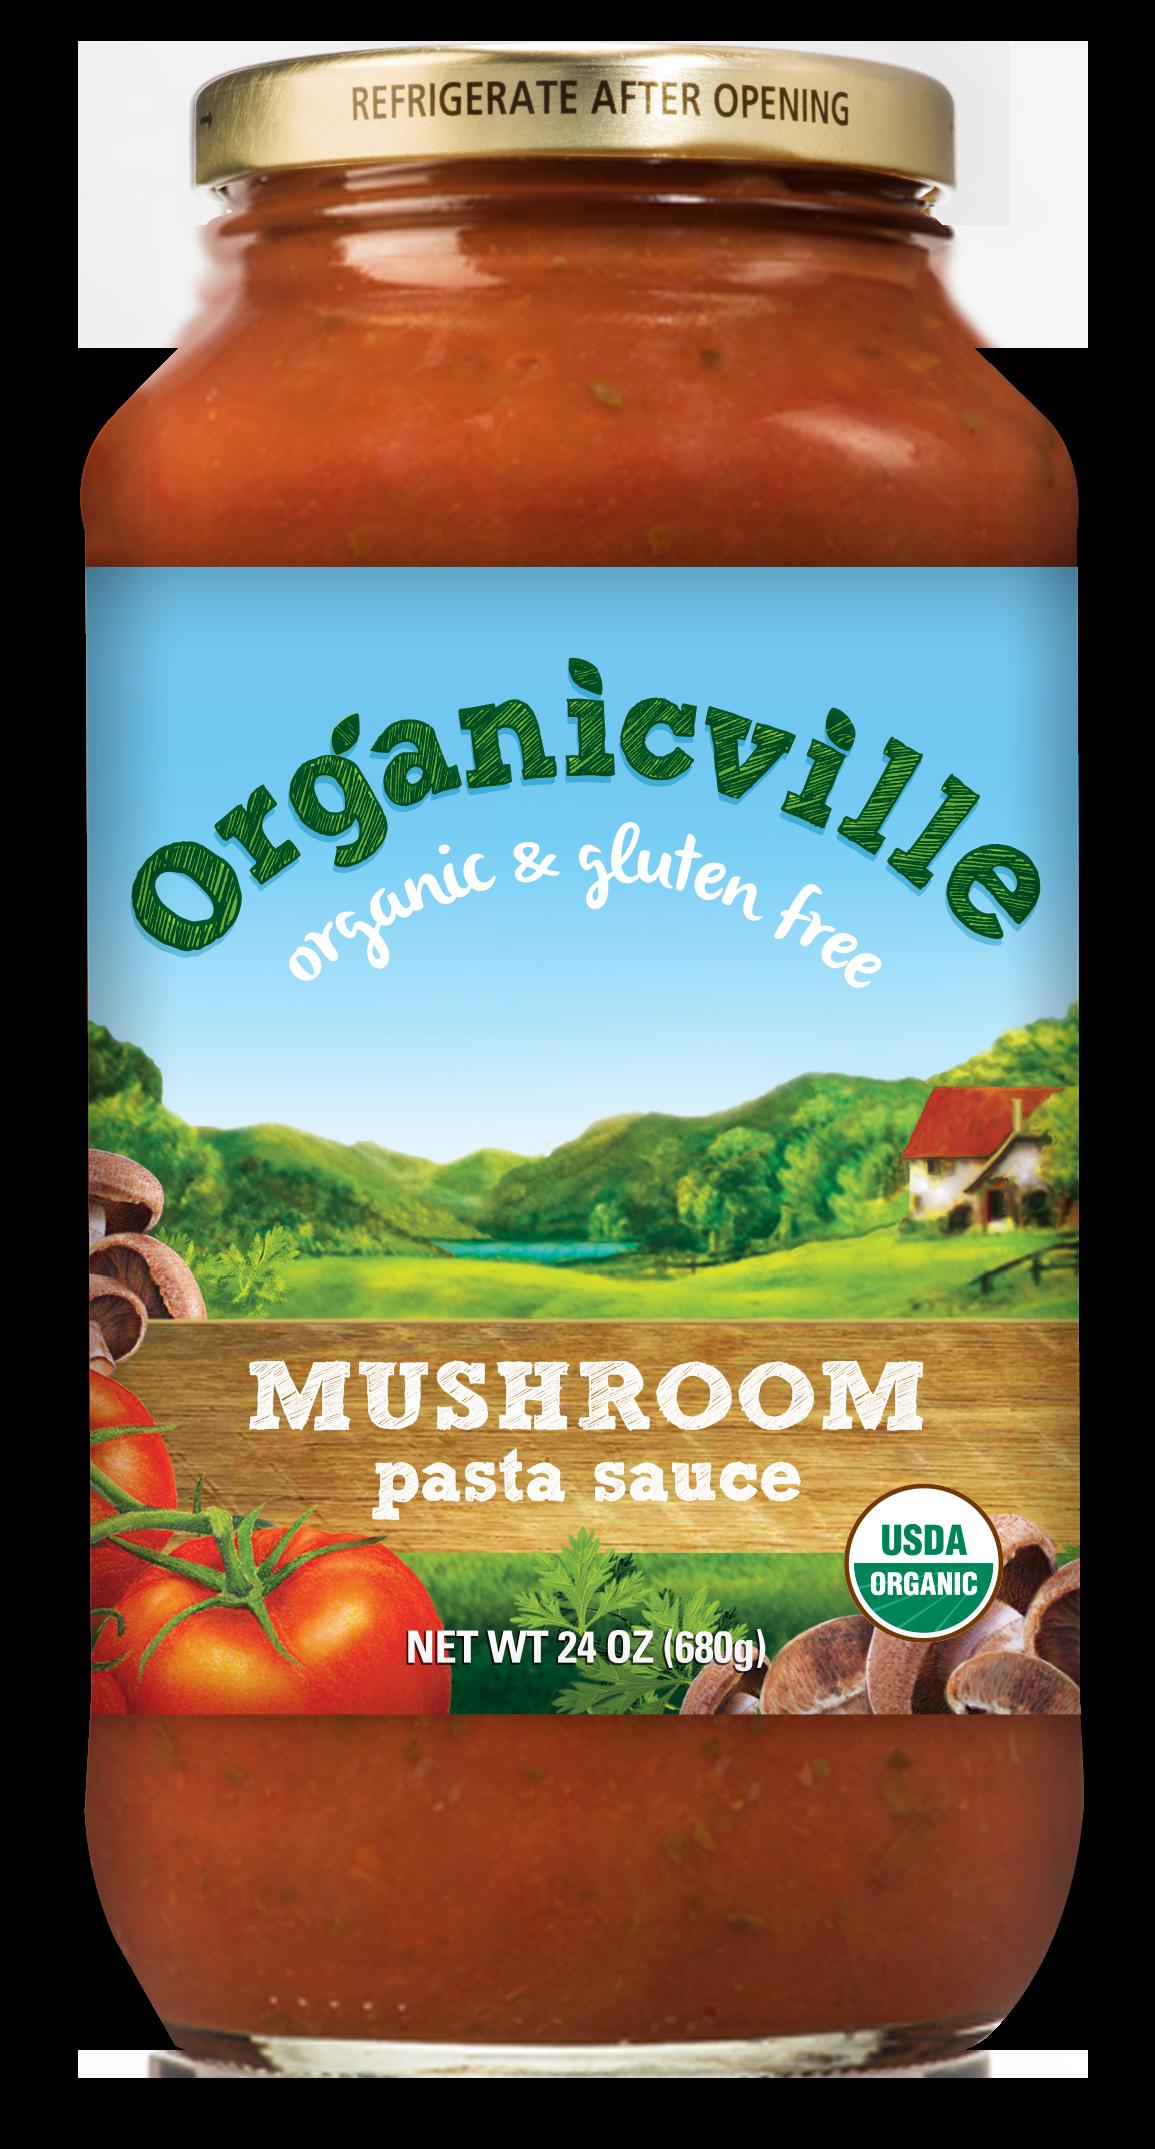 OV_eCOM_24oz_Mushroom.png